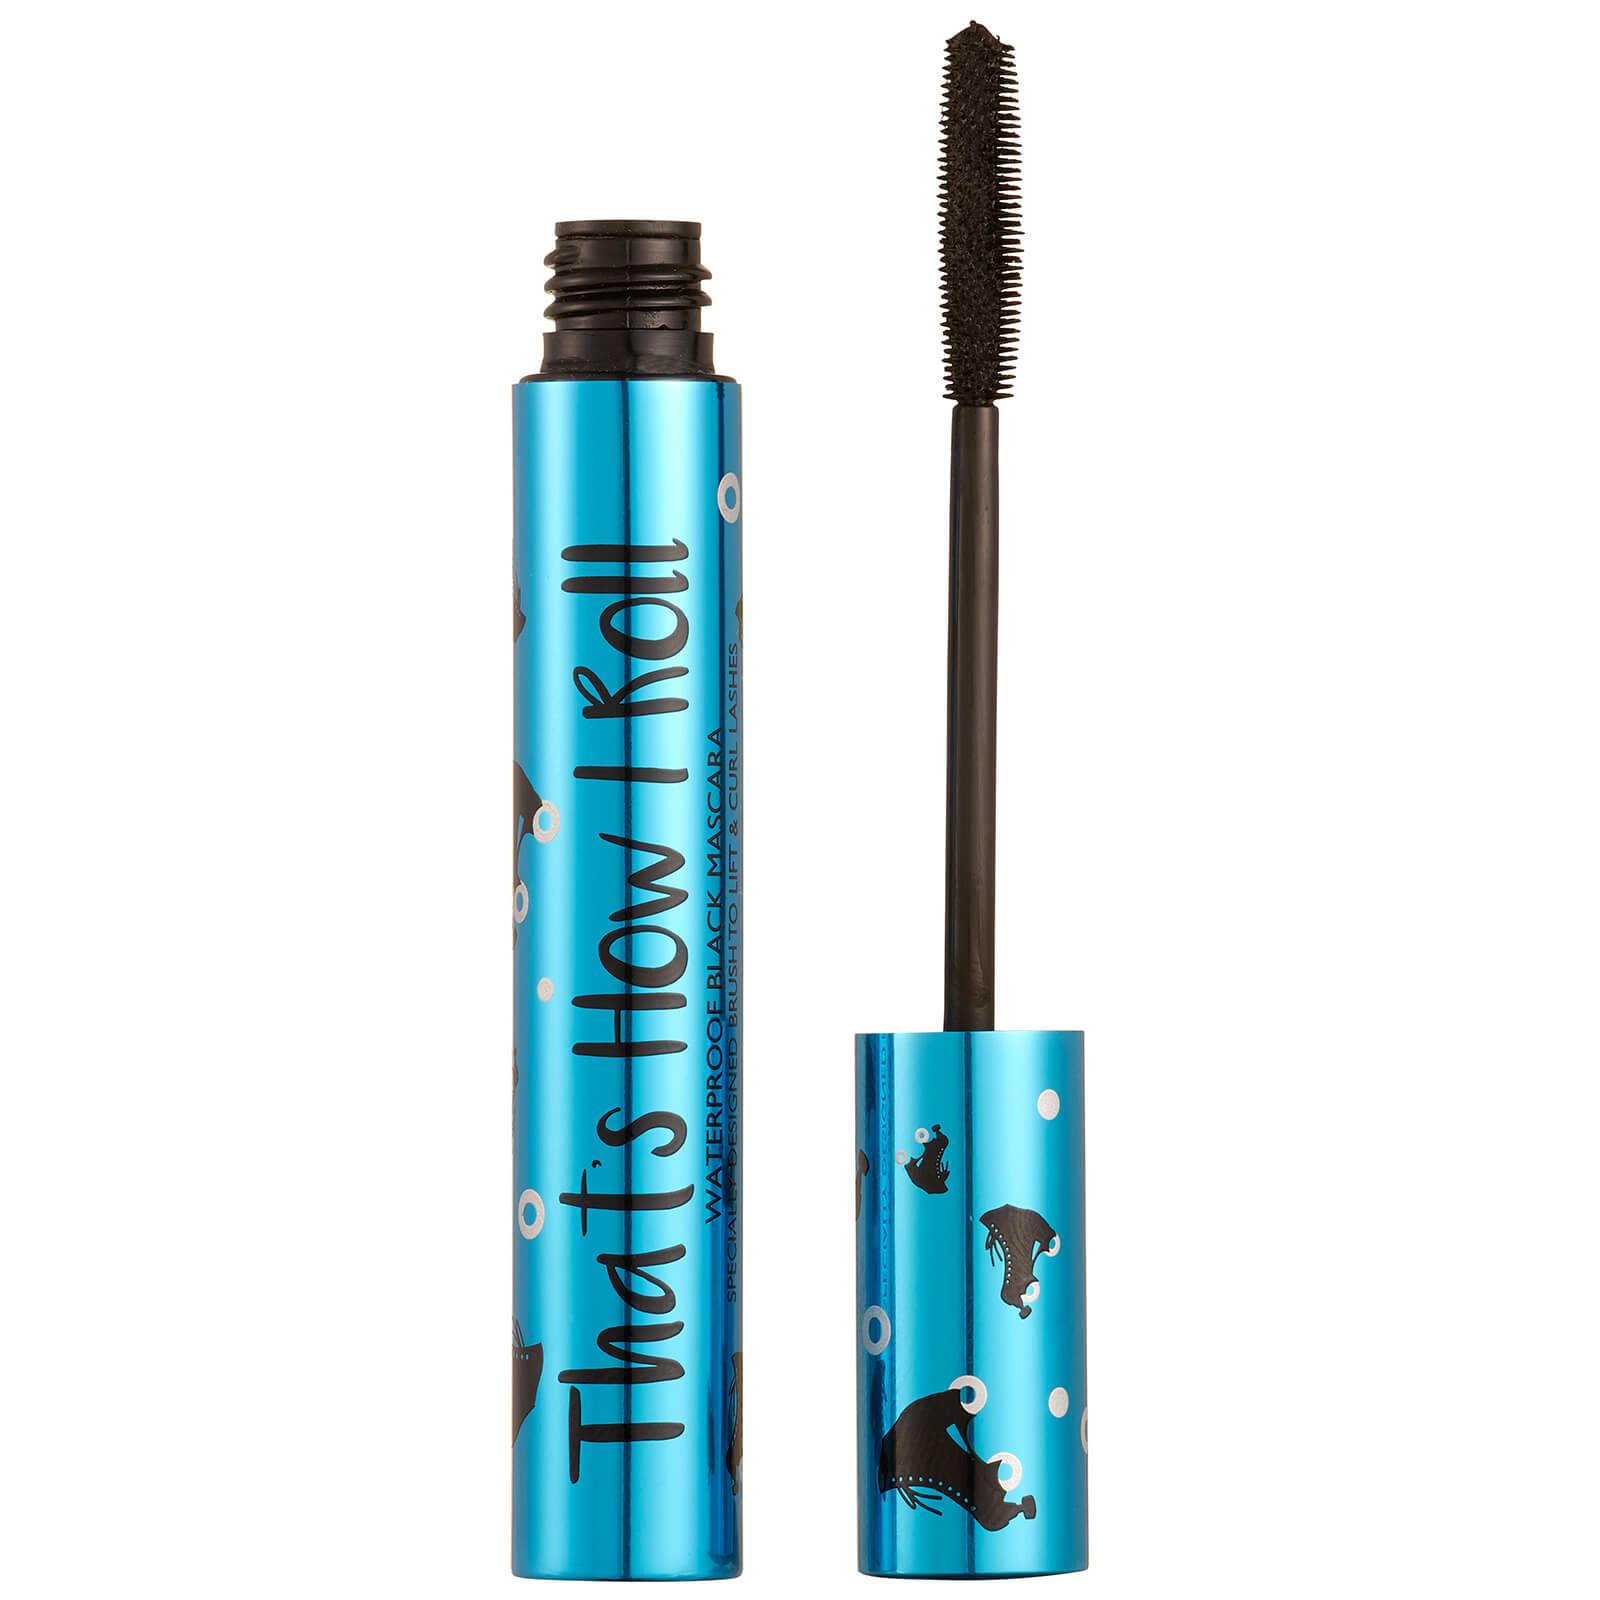 Купить Barry M Cosmetics That's How I Roll Waterproof Mascara